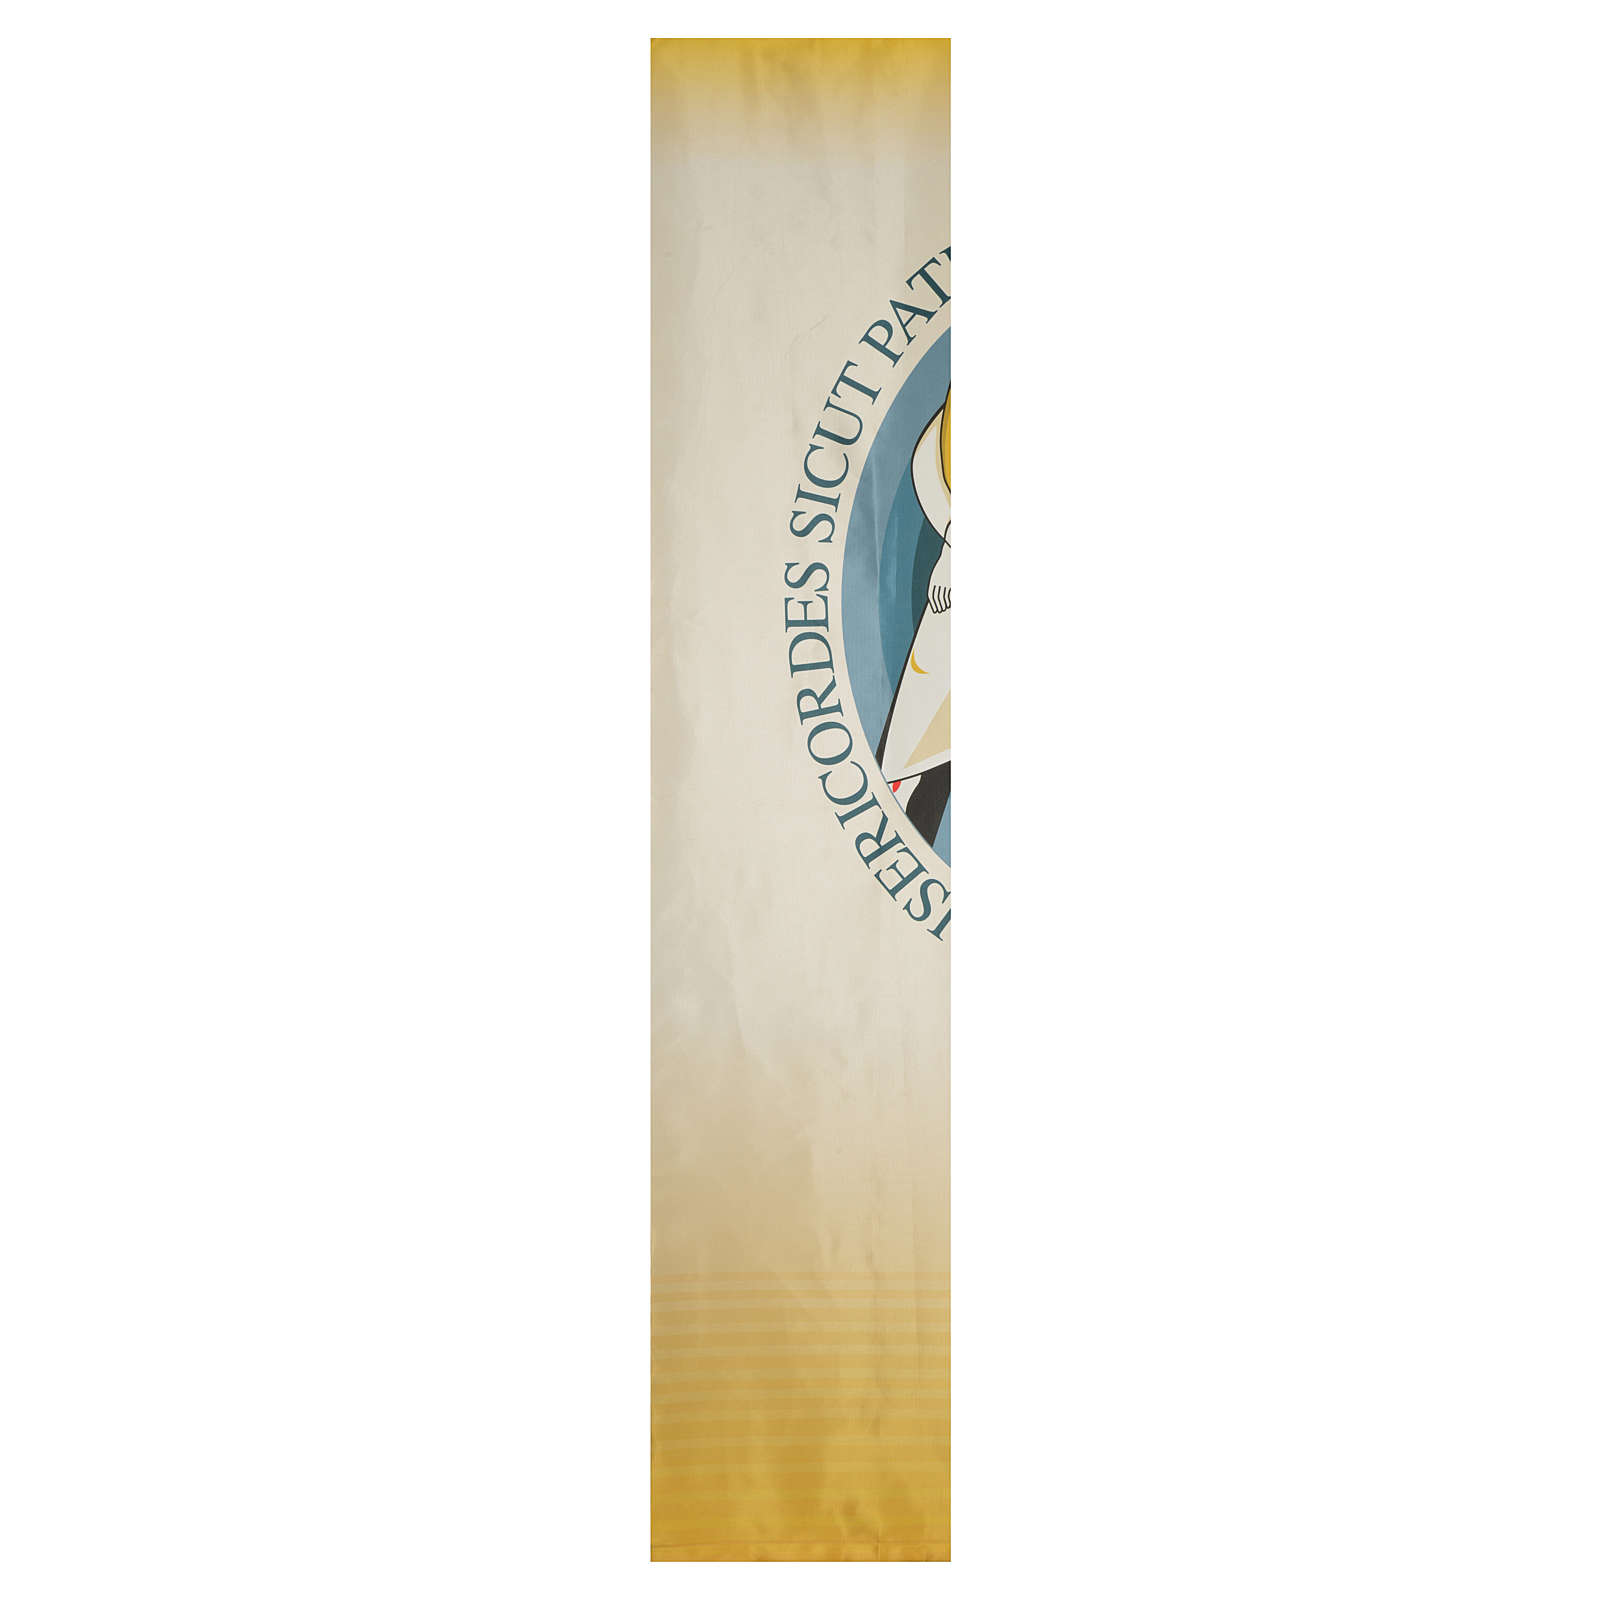 STOCK Logo Jubilé Miséricorde sur tissu 90x200cm 3